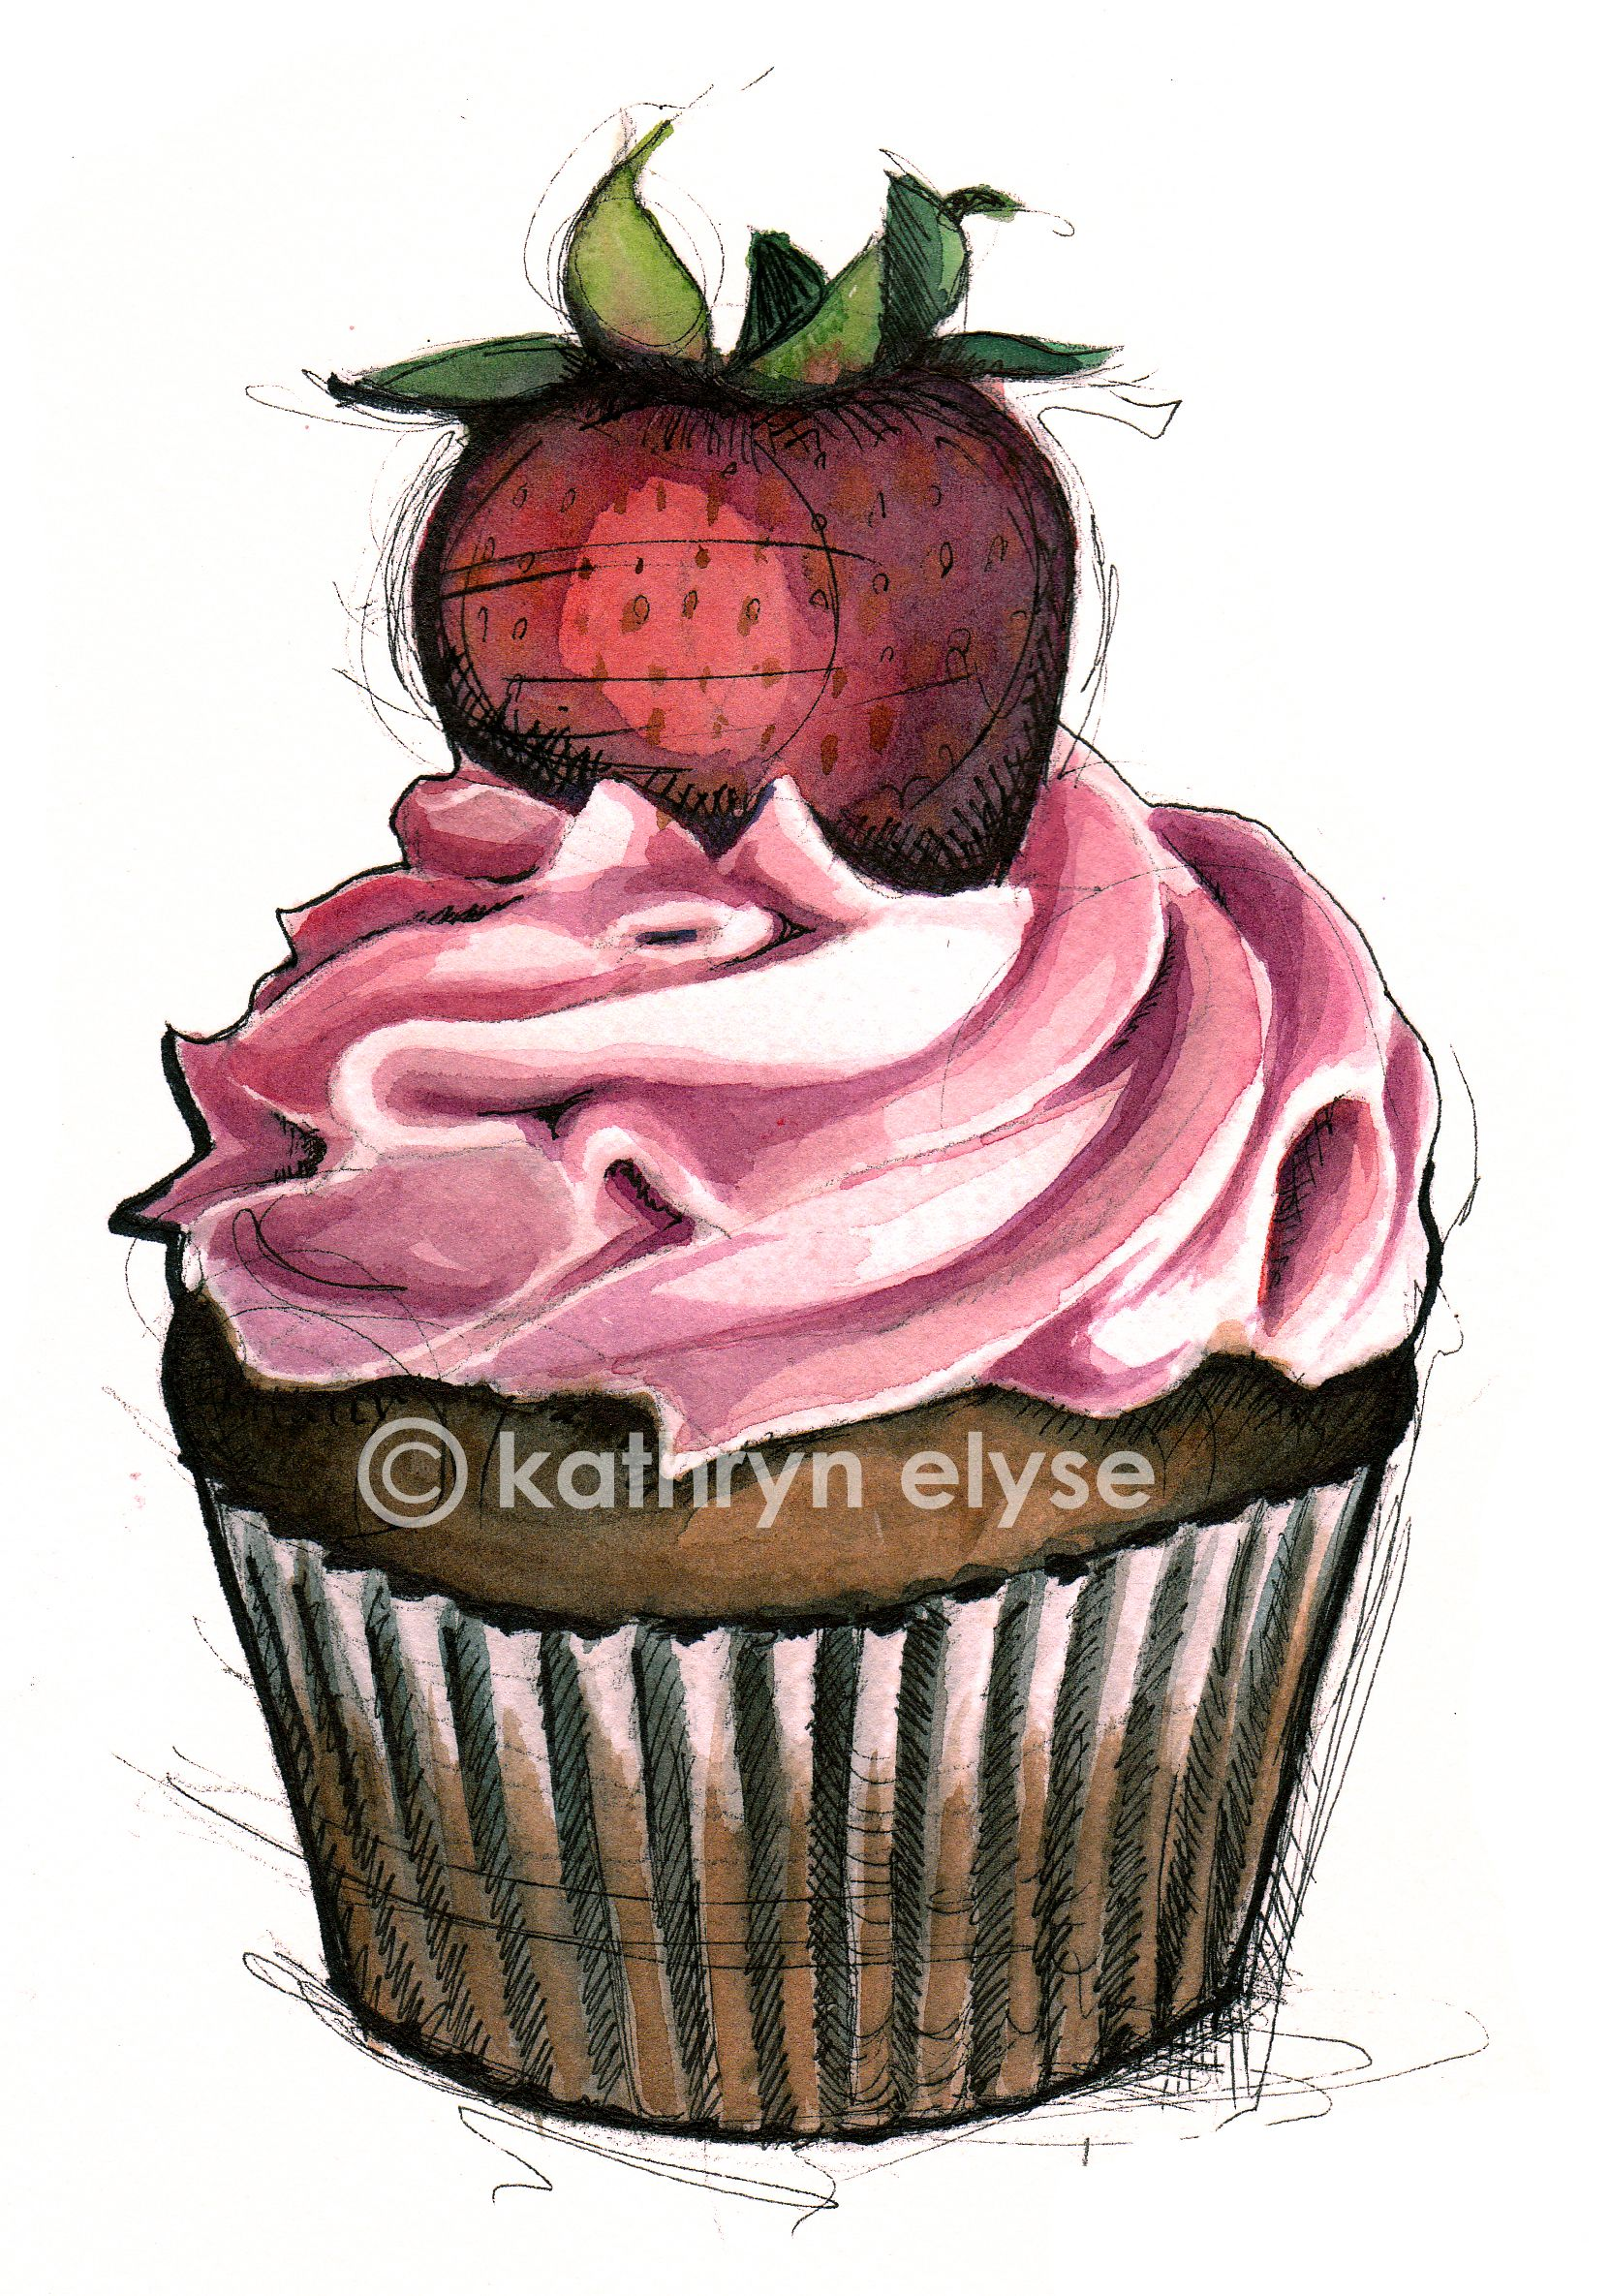 Cupcakecp Jpg 1662 2370 Cupcake Illustration